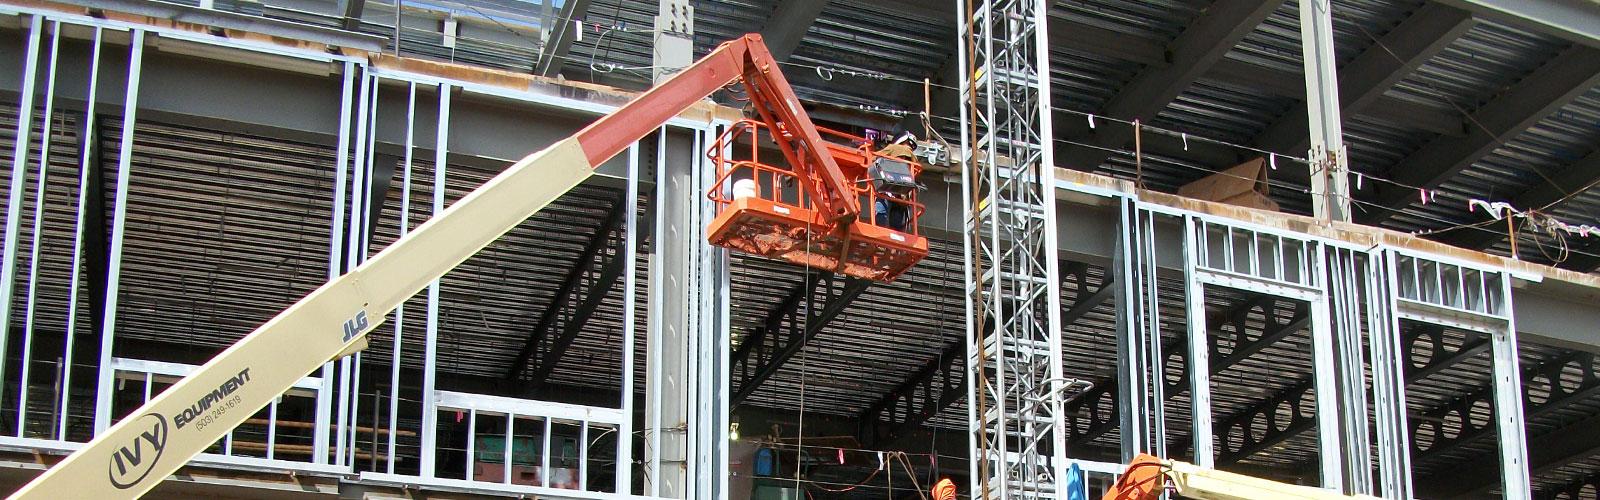 construction crane next to half developed building structure